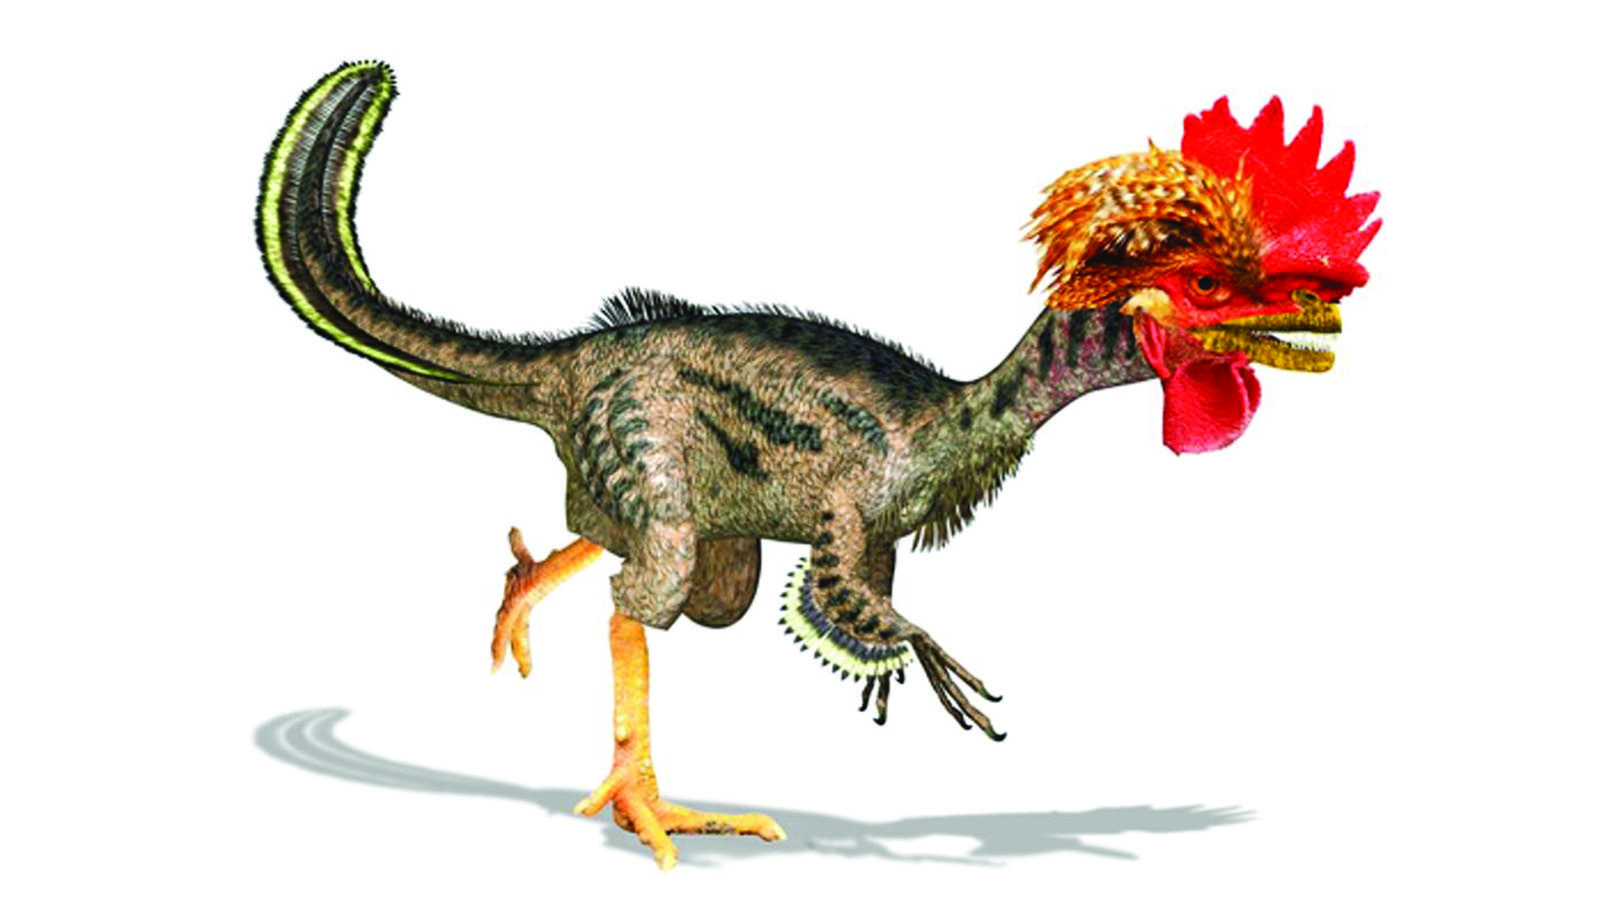 Turning Birds into Dinosaurs using gene therapy, the dino-chicken